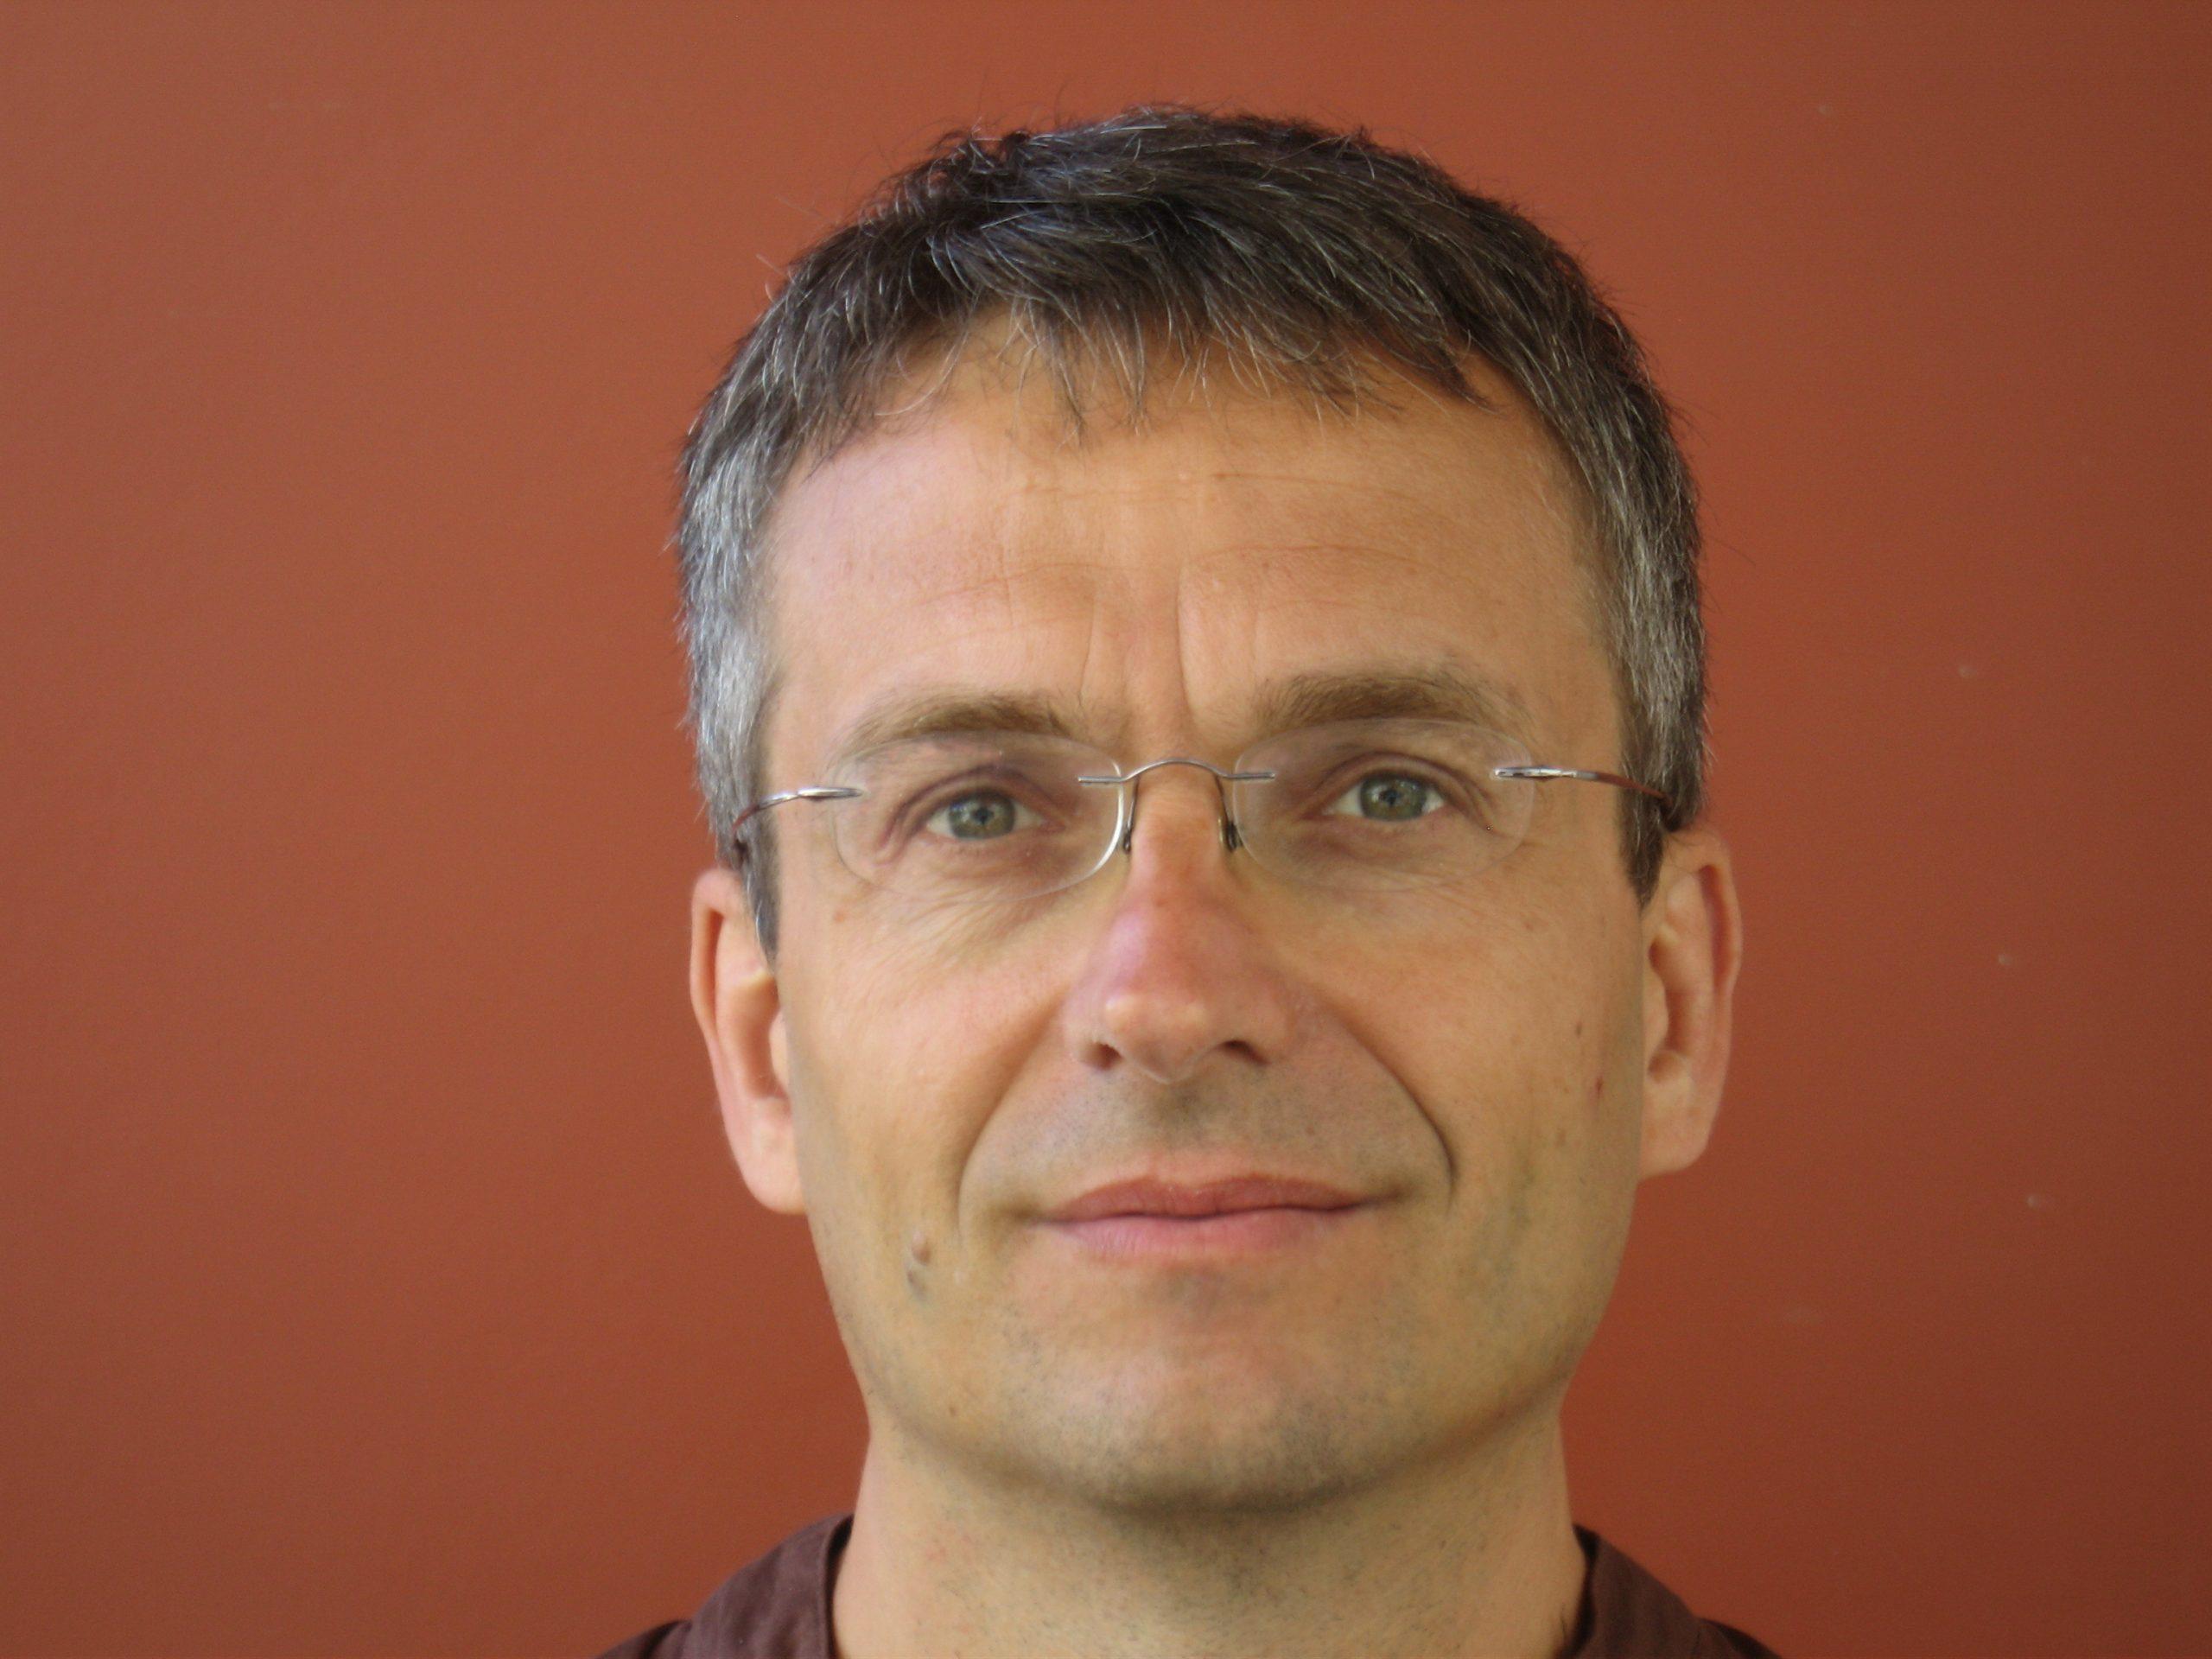 Pfarrer Markus Beile